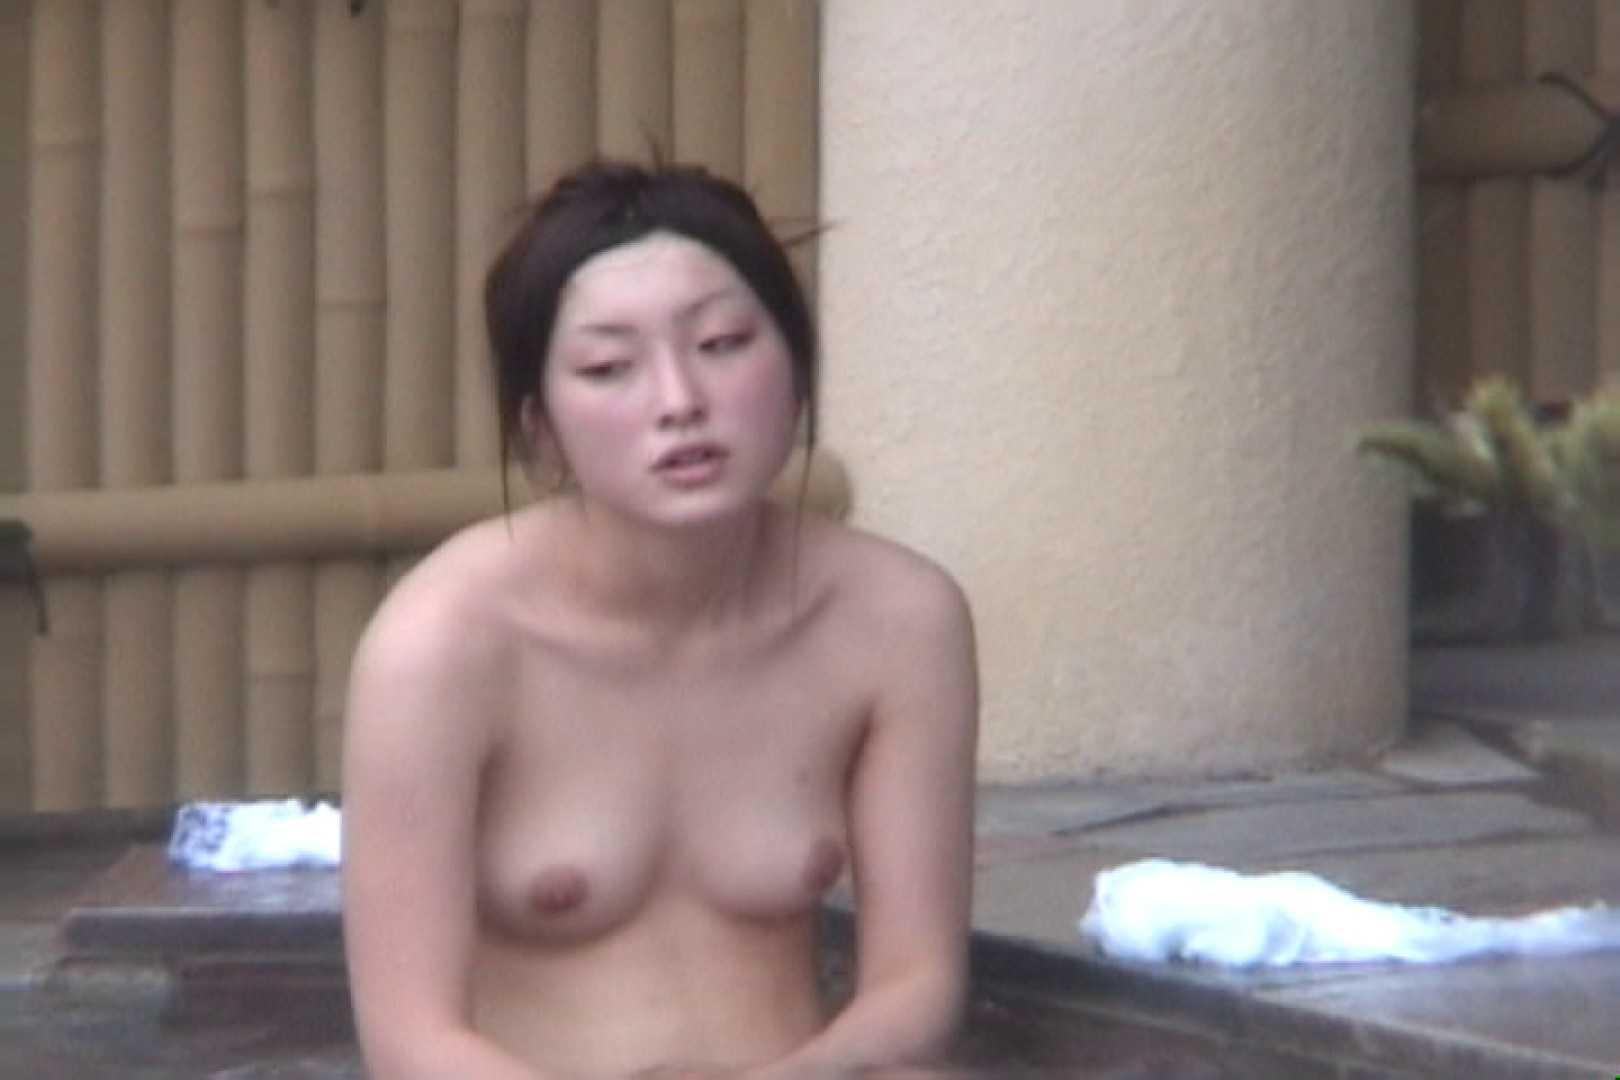 Aquaな露天風呂Vol.44【VIP限定】 OL  19連発 18